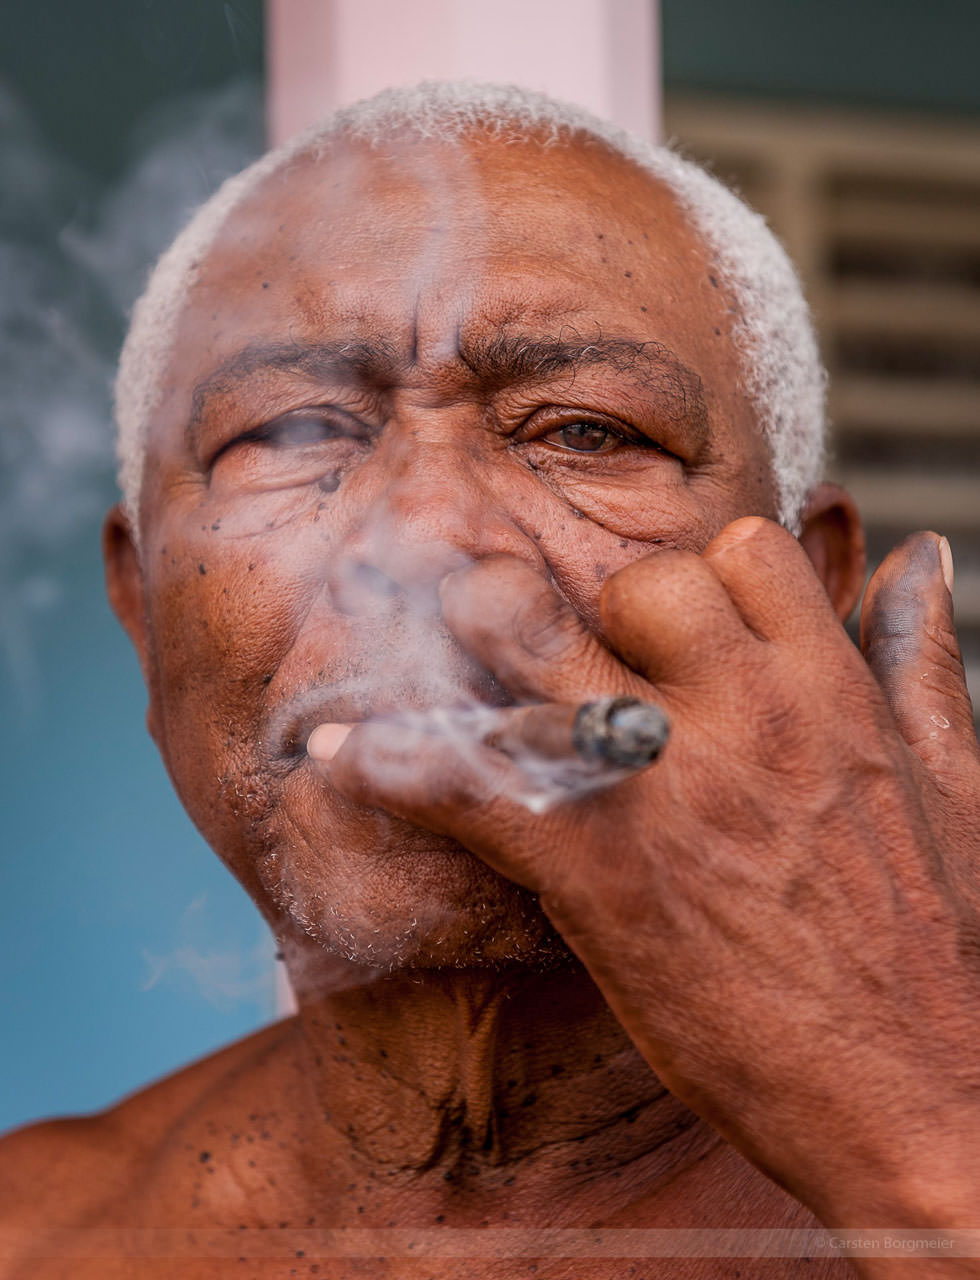 Drei Finger in der Zigarren-Produktion abgeschnitten, fotografiert in Vinales am 31. Mai 2009